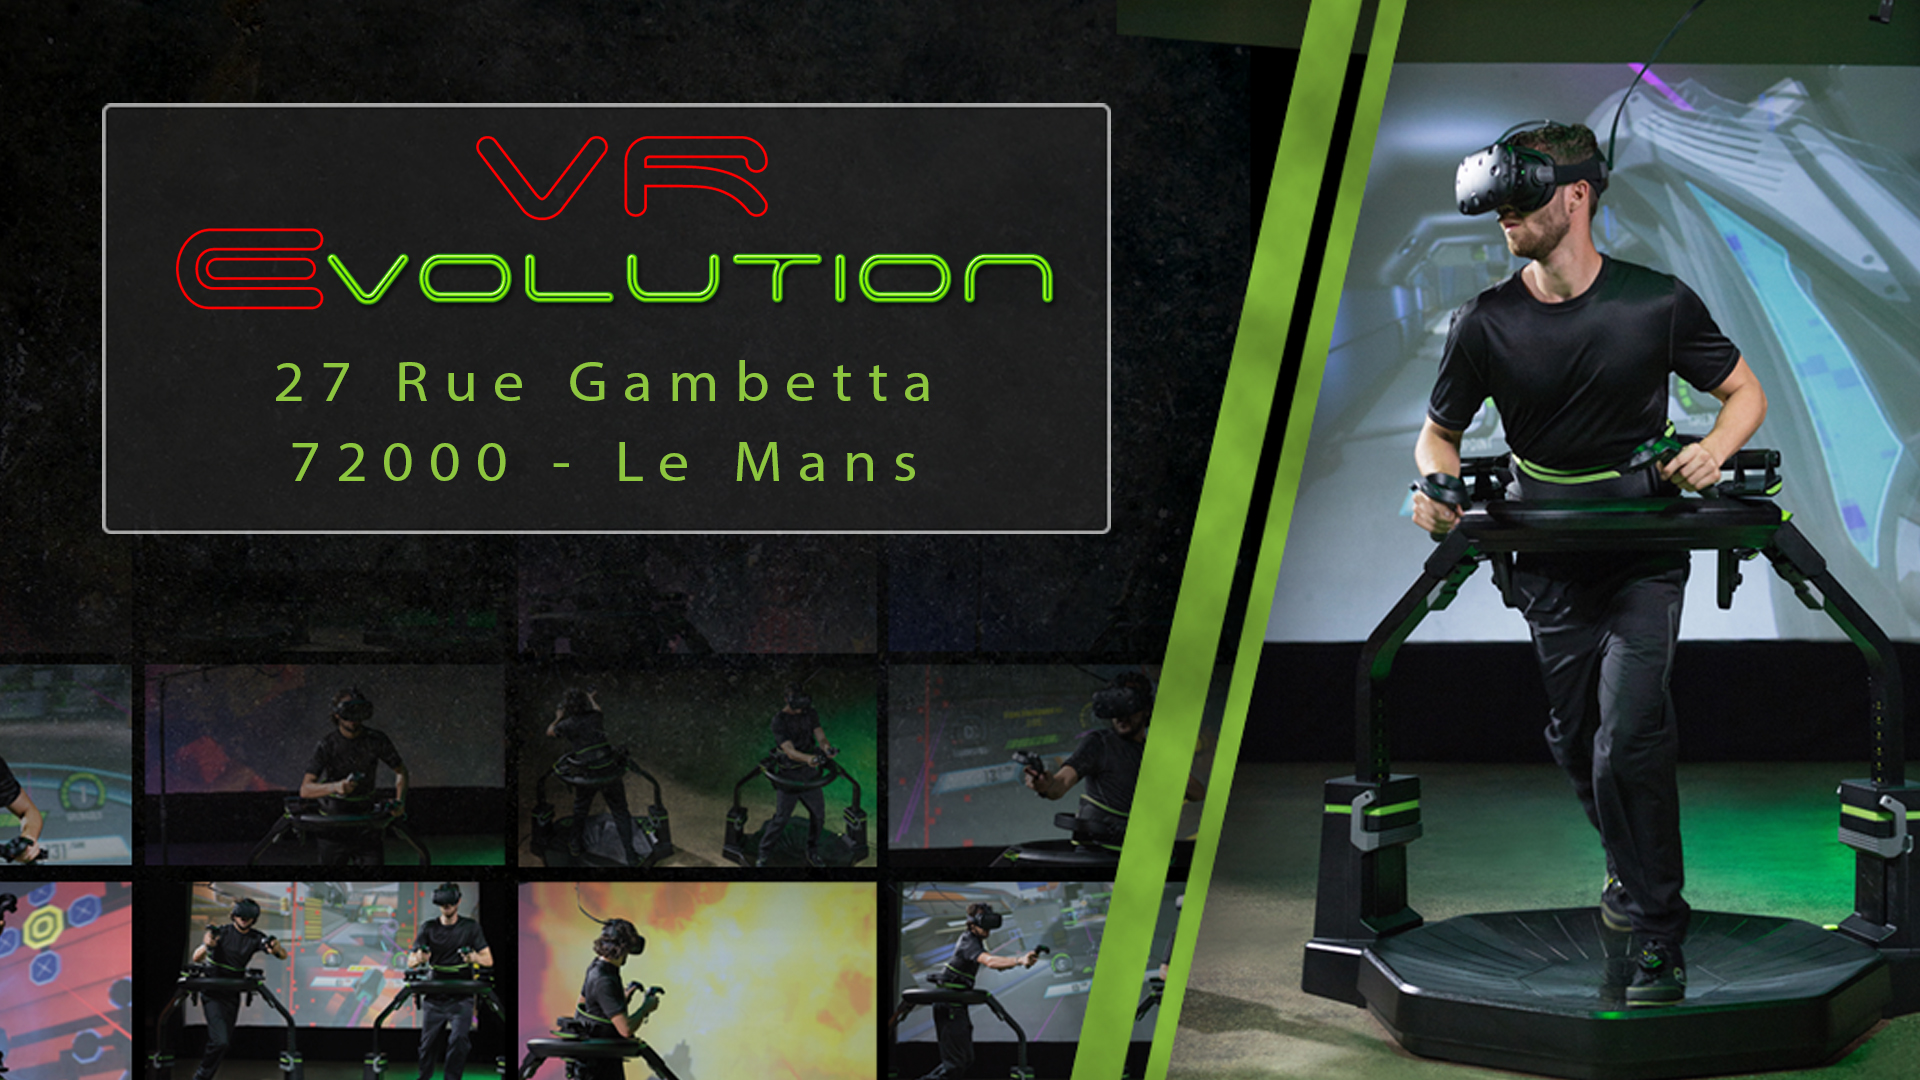 VR Evolution